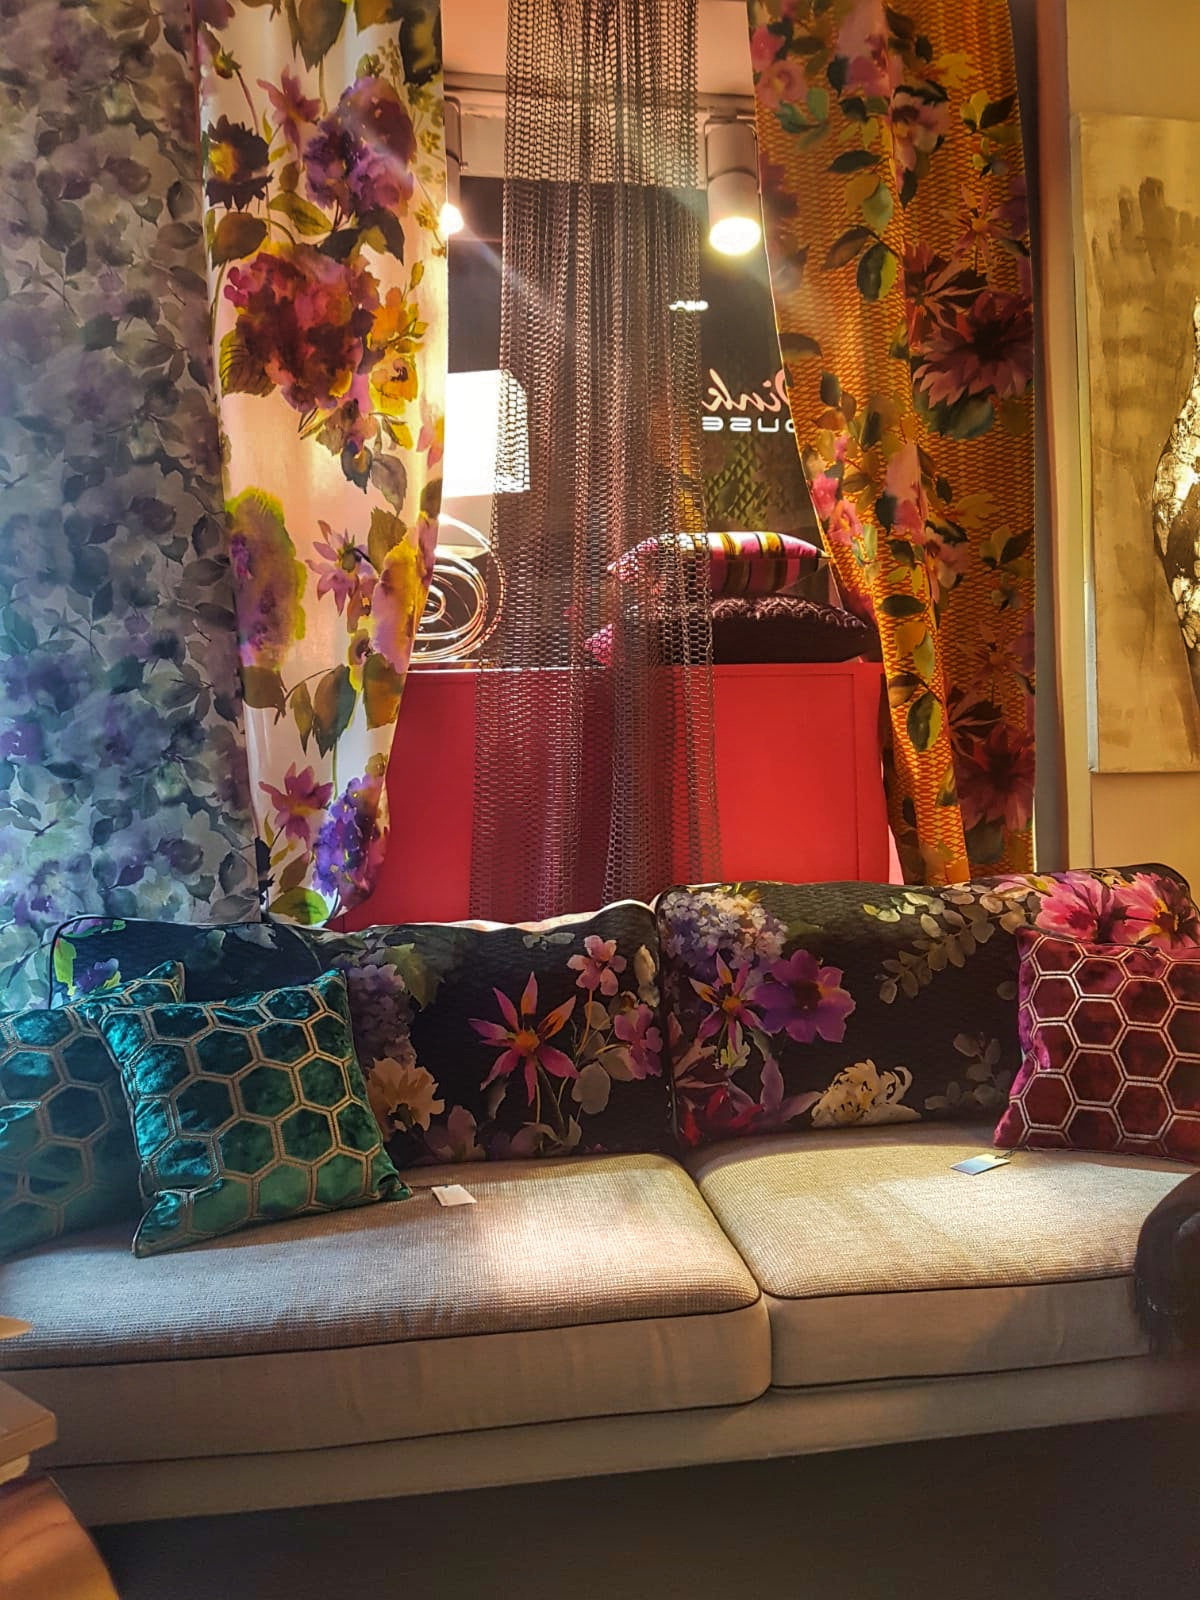 sara-rombola-pink-house-arredatrice-interior-designer-torino-talentieventi-21